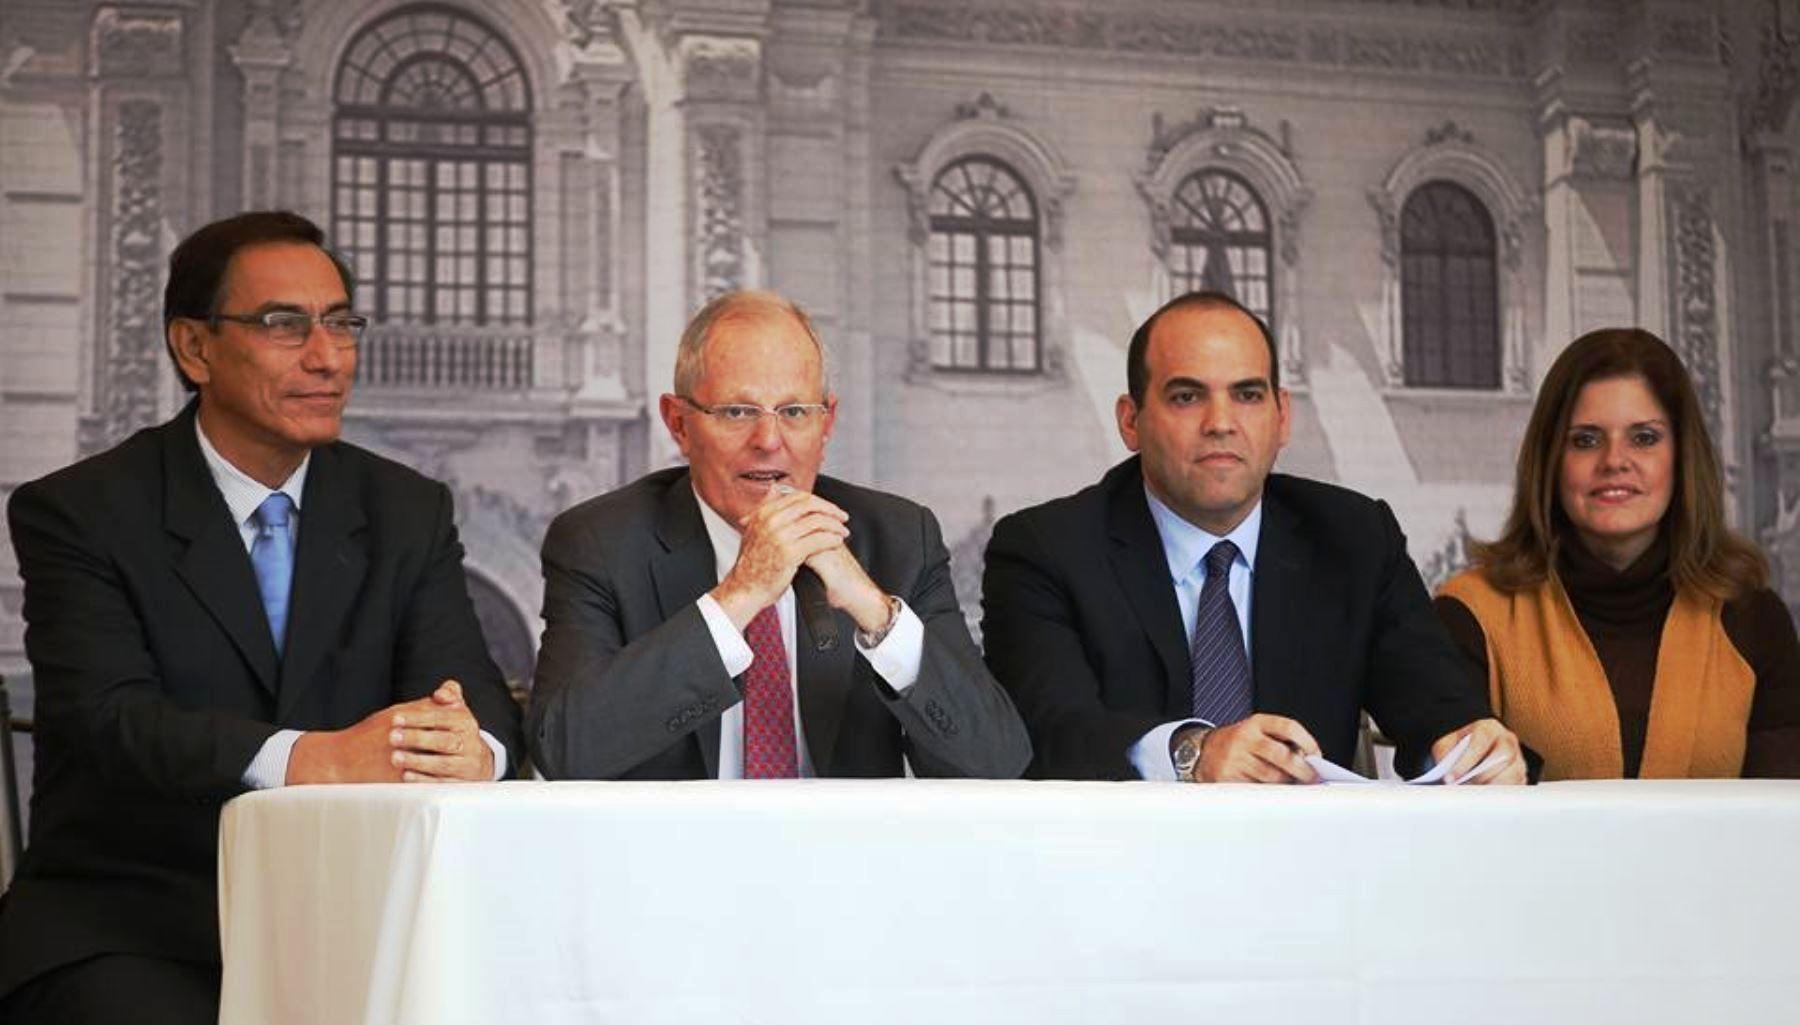 Peru President-elect Kuczynski's new Cabinet ministers